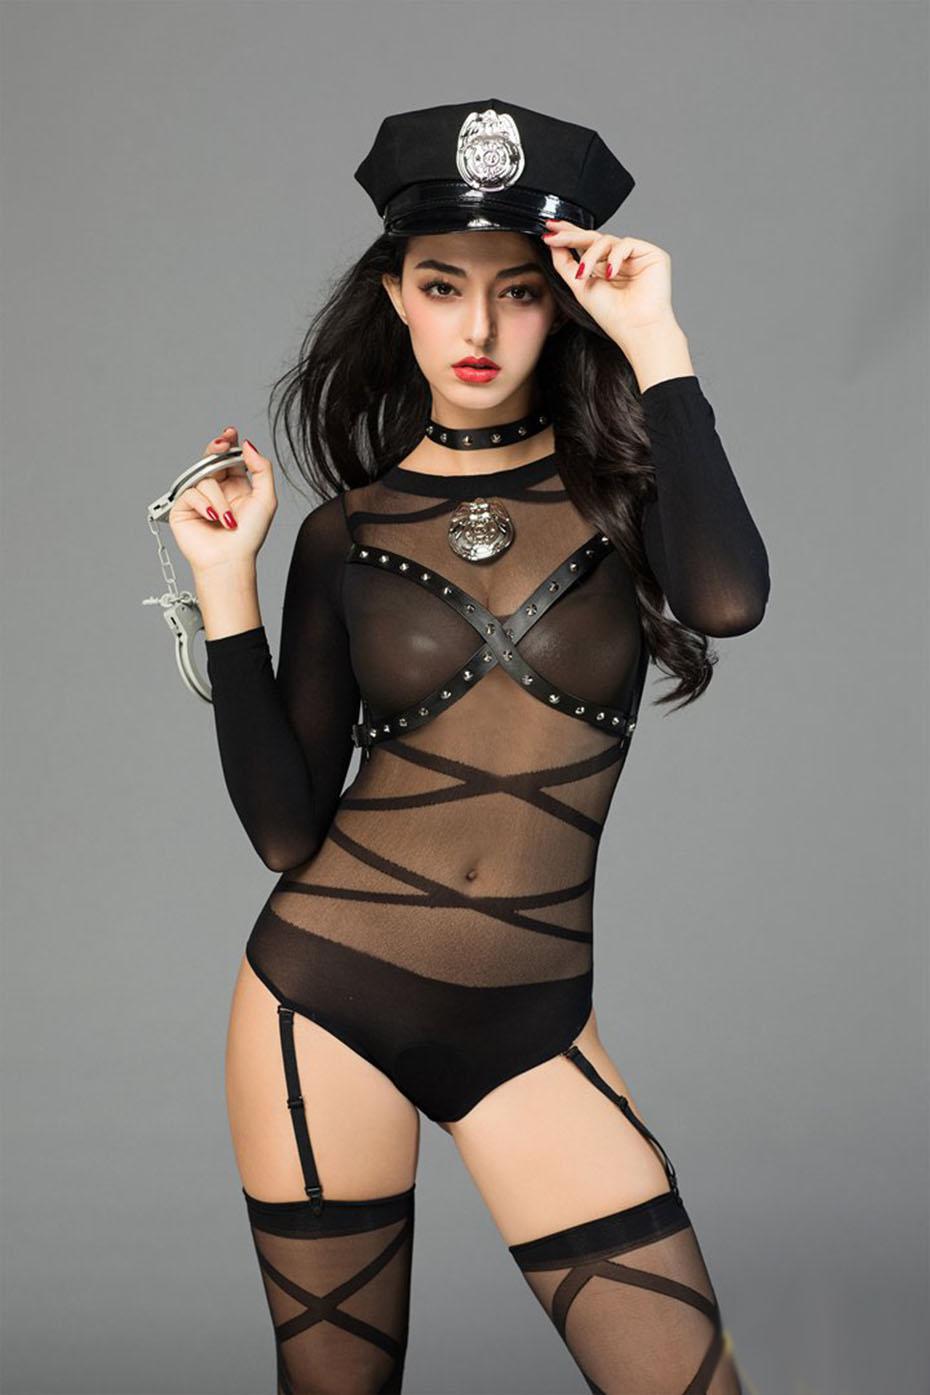 Porn women in police uniforms